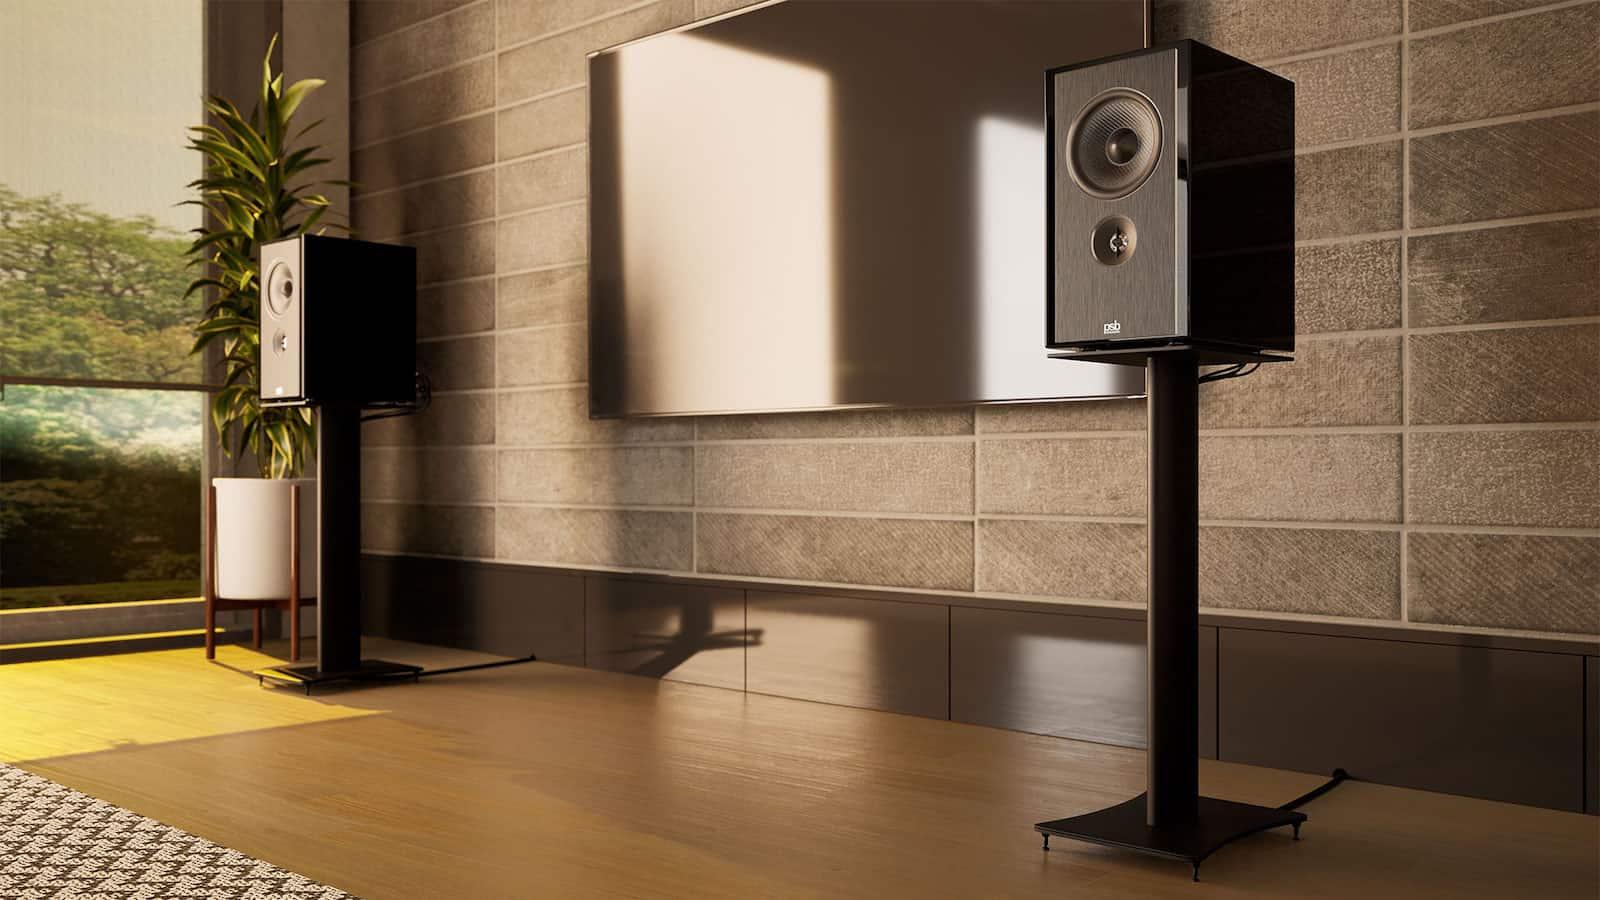 psb-b600-bookshelf-speaker-lifestyle